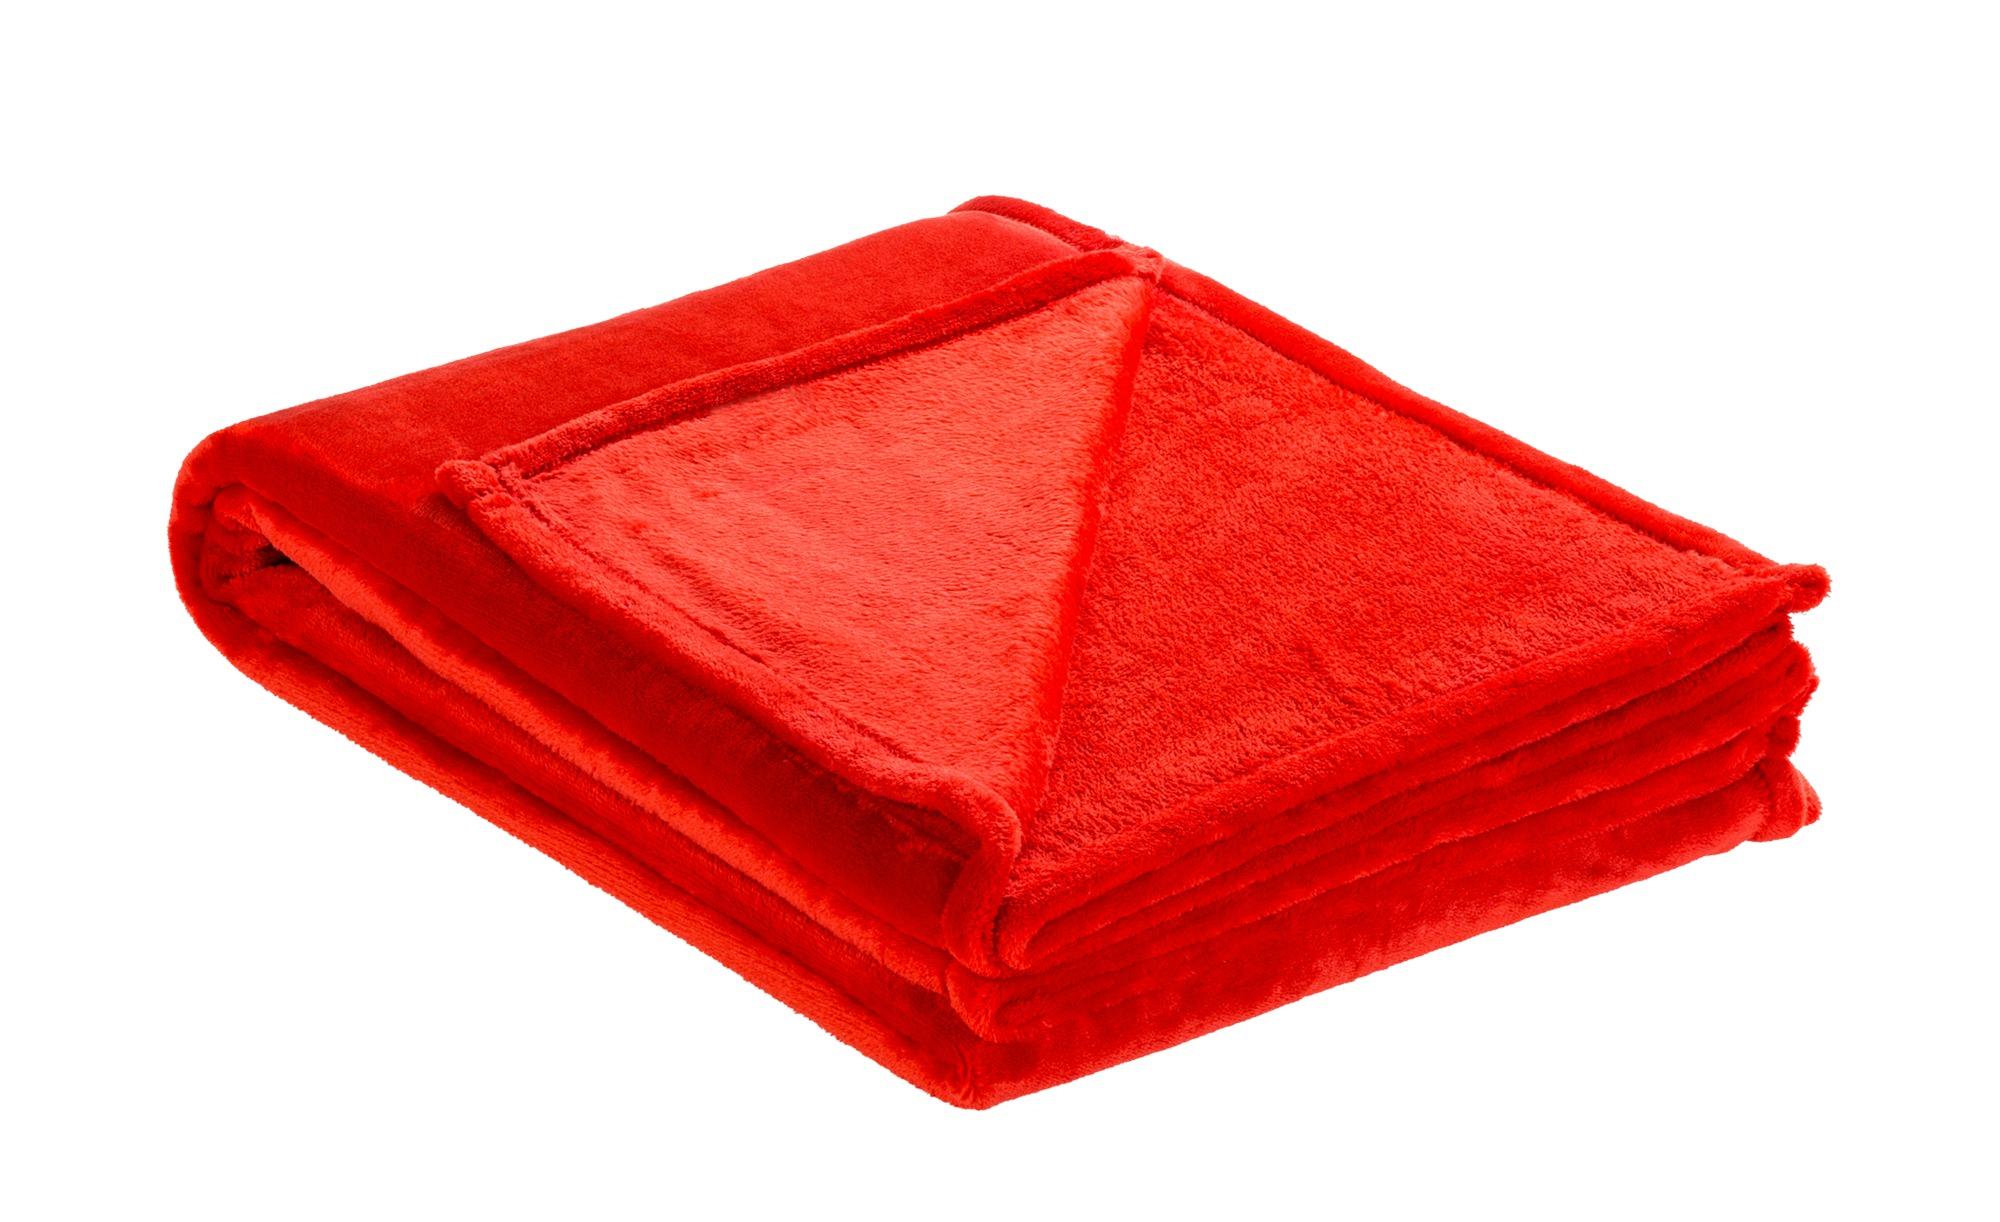 LAVIDA Soft Flauschdecke  Mirabelle ¦ rot ¦ 100% Polyester ¦ Maße (cm): B: 150 Heimtextilien > Kuscheldecken - Höffner